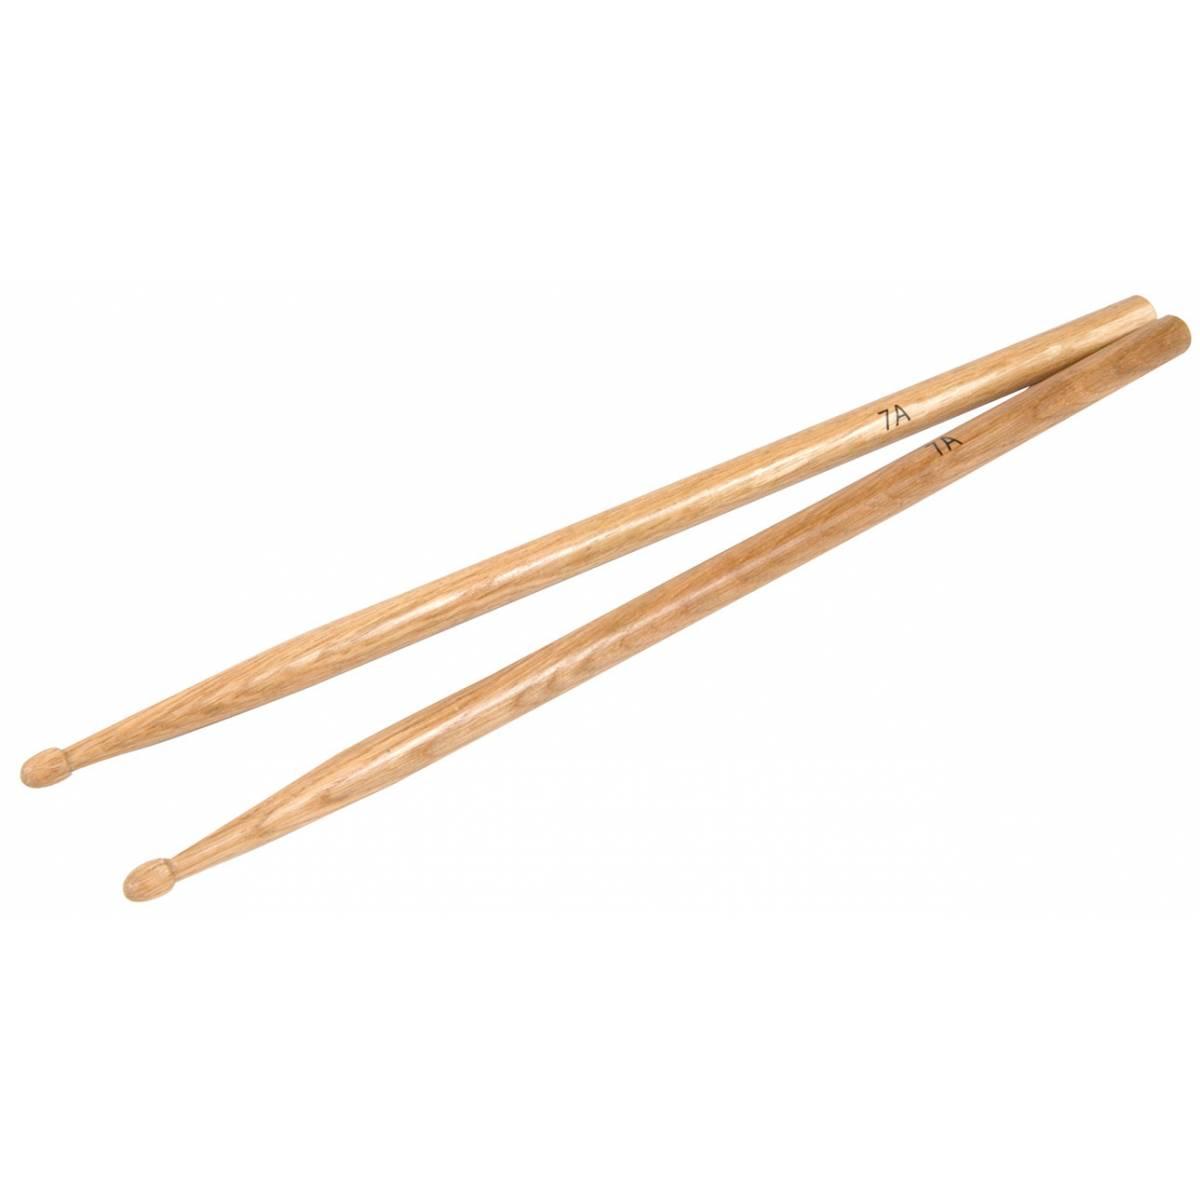 alesis performance pad pro plus free drum sticks. Black Bedroom Furniture Sets. Home Design Ideas